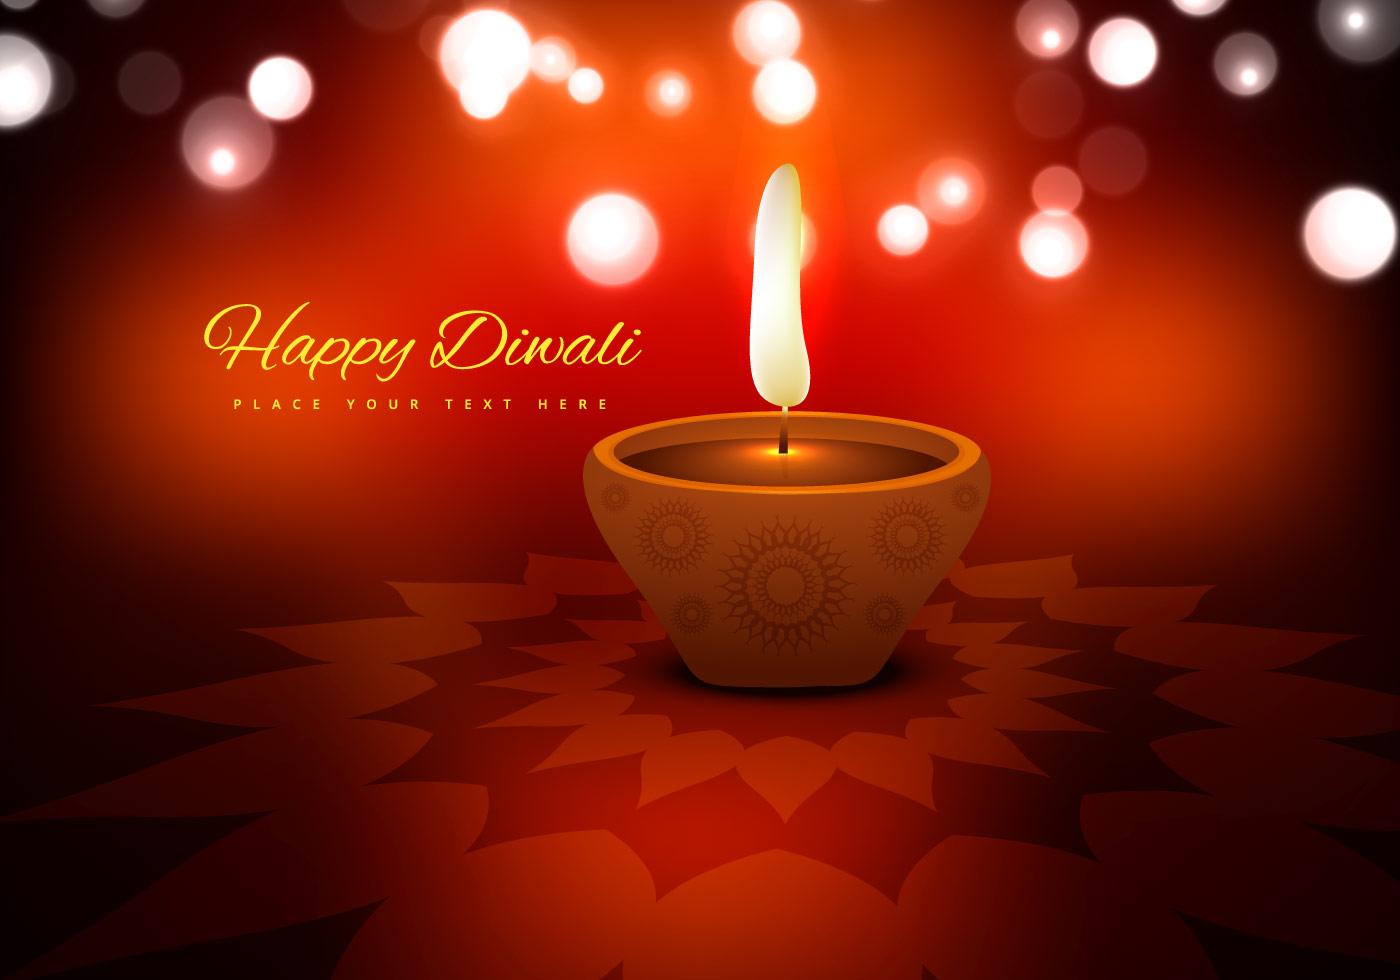 Diwali Festival With Beautiful Oil Lamp Download Free